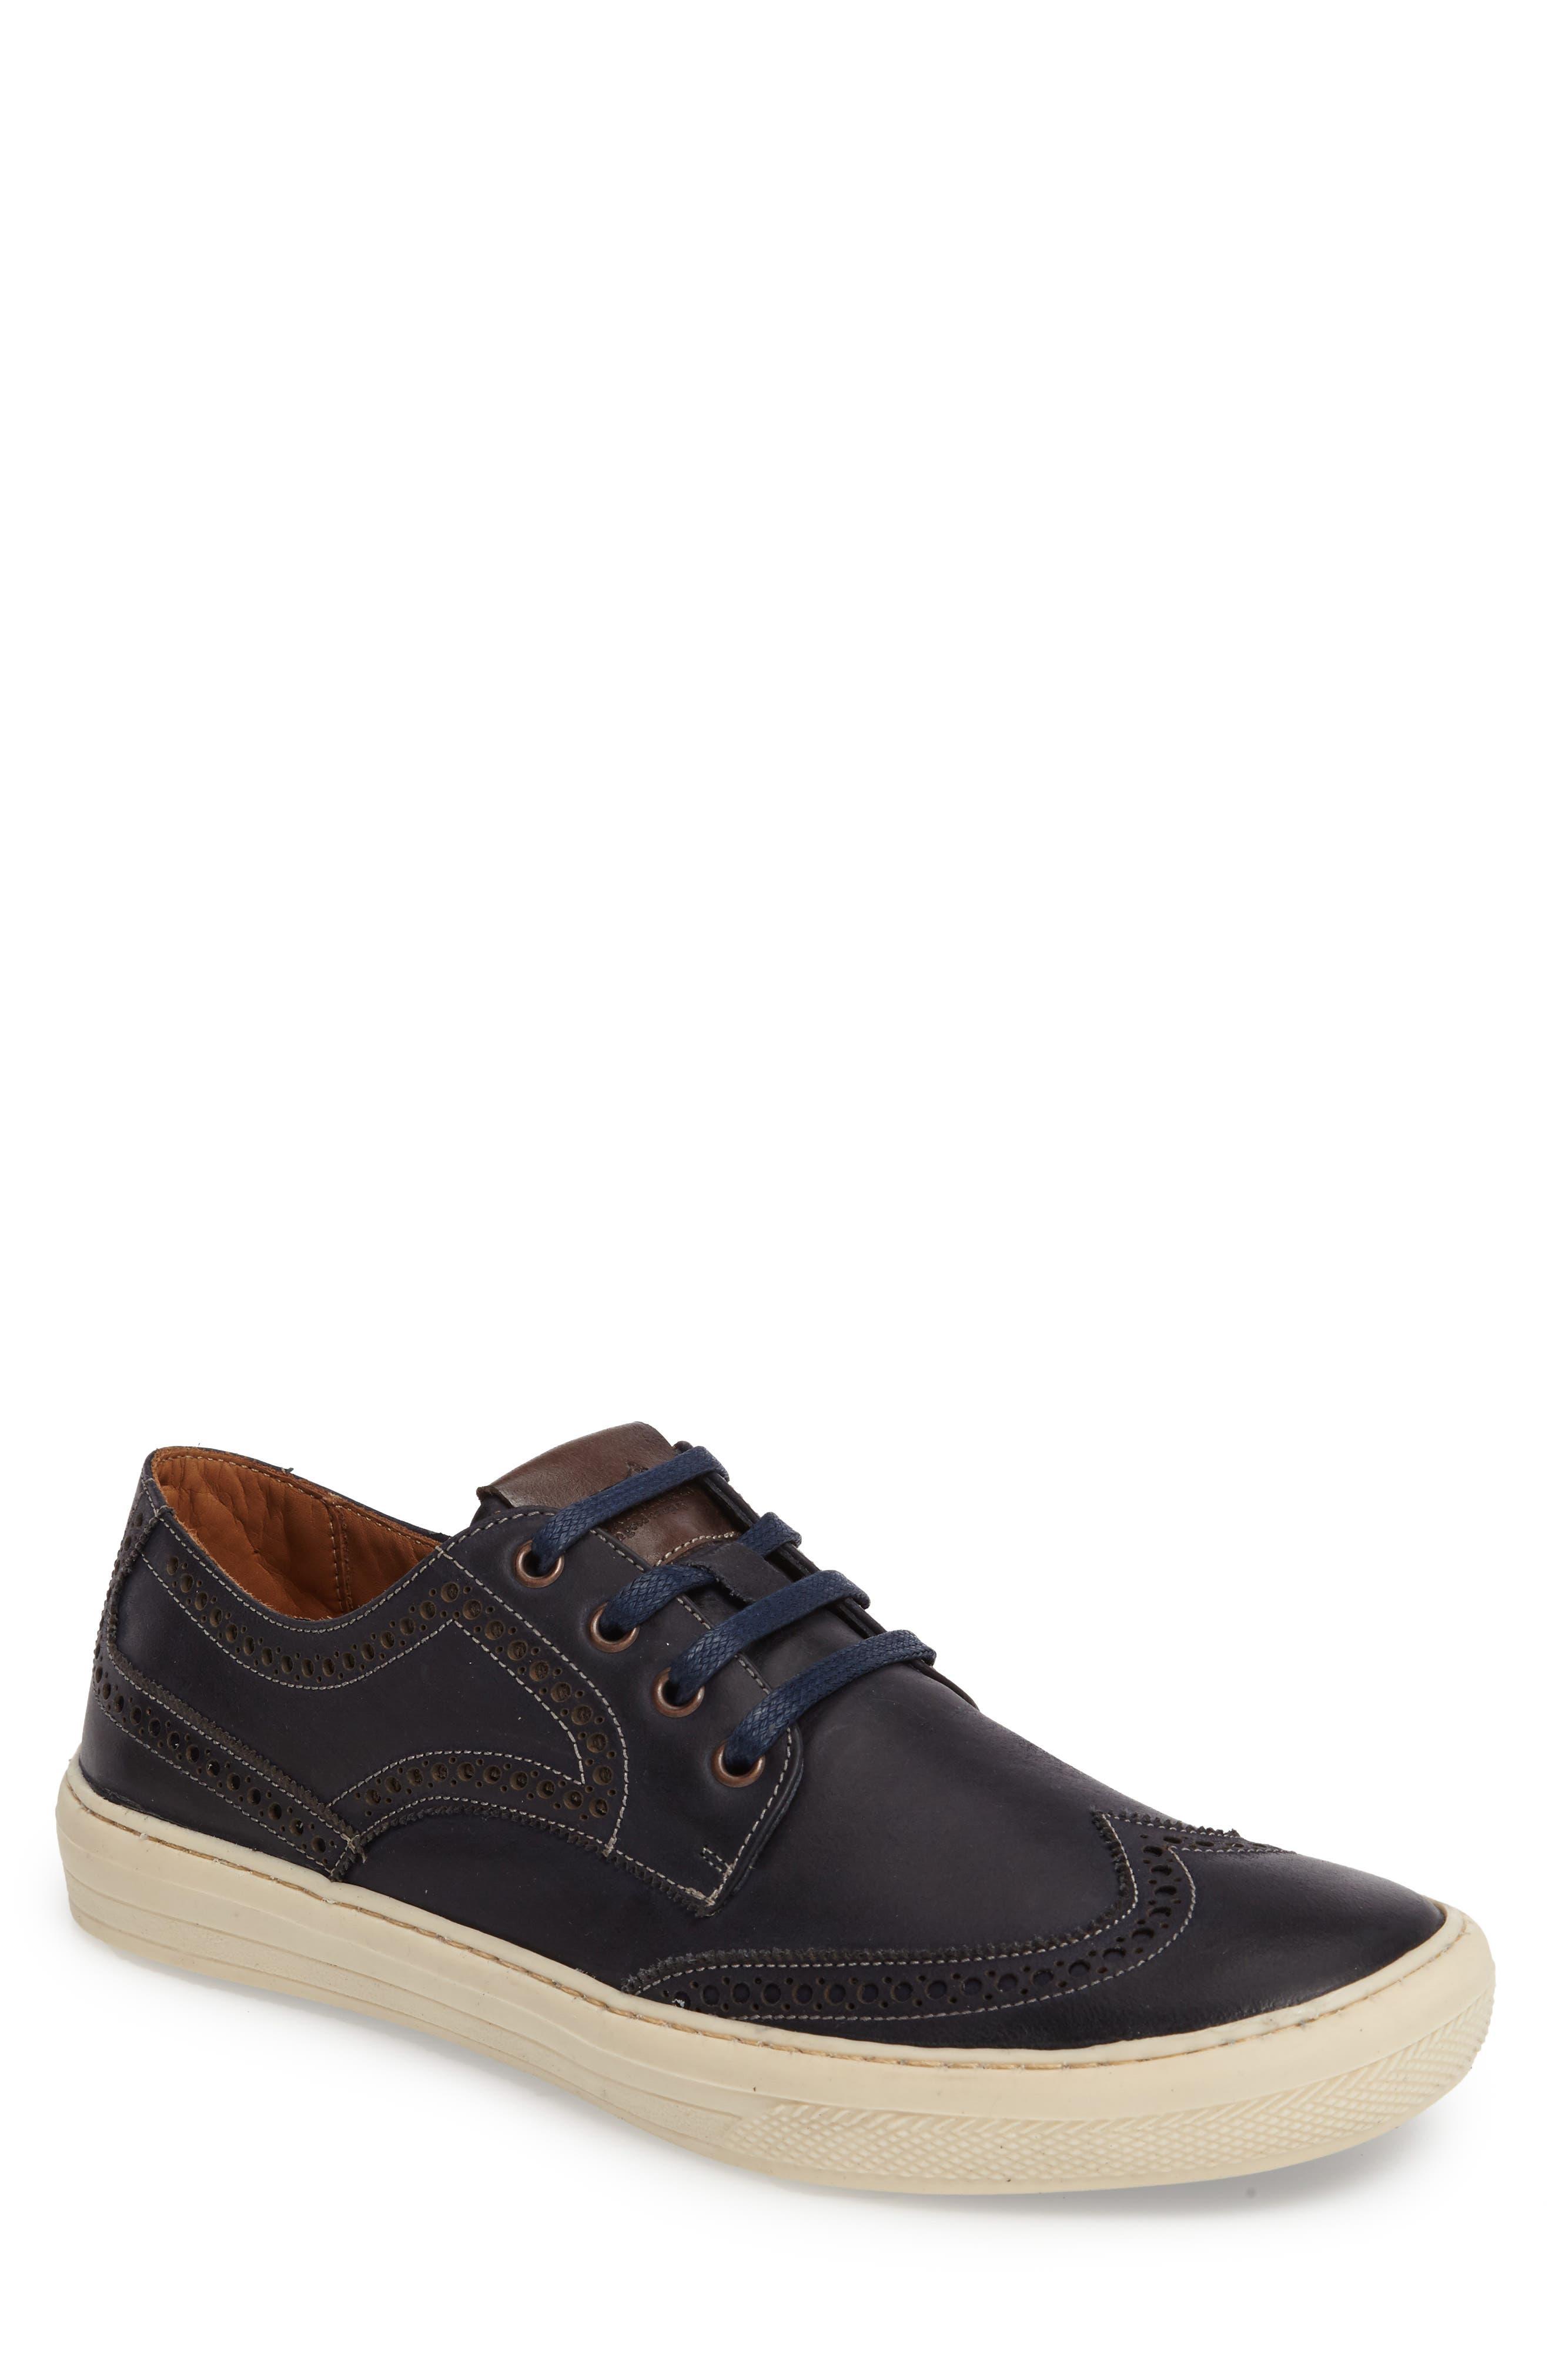 Anatomic & Co. Bariri Wingtip Sneaker (Men)